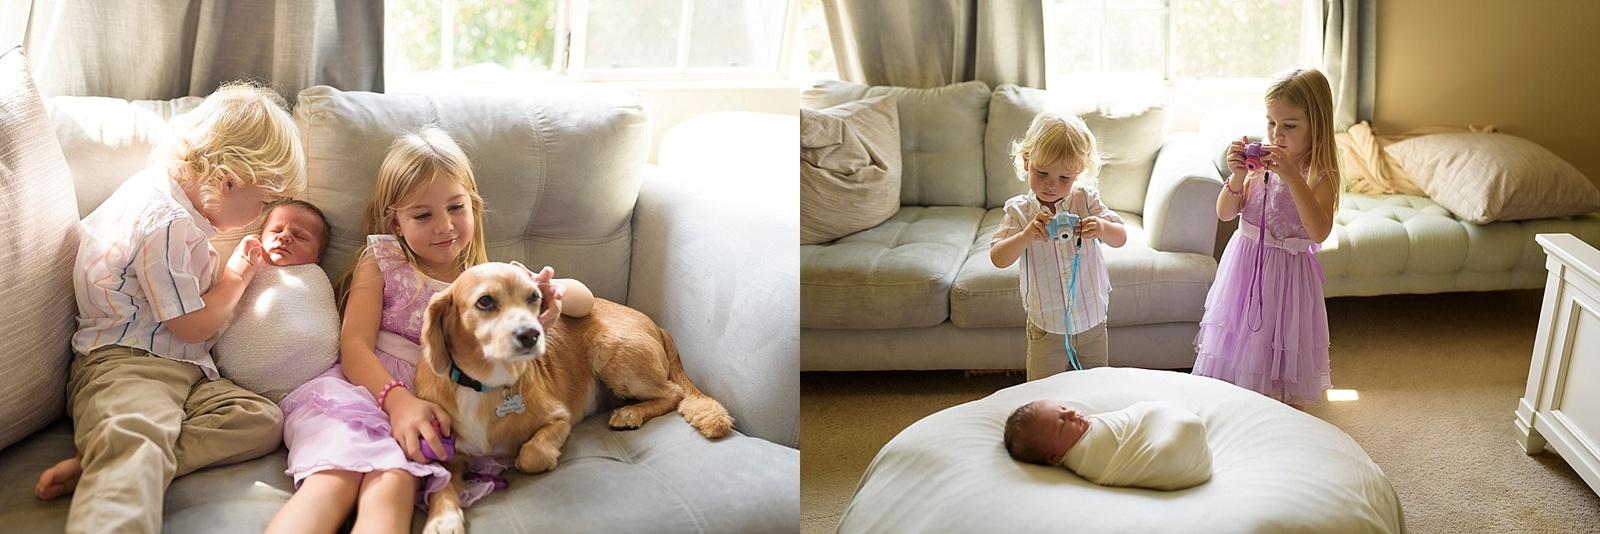 Siblings participate in newborn photo shoot